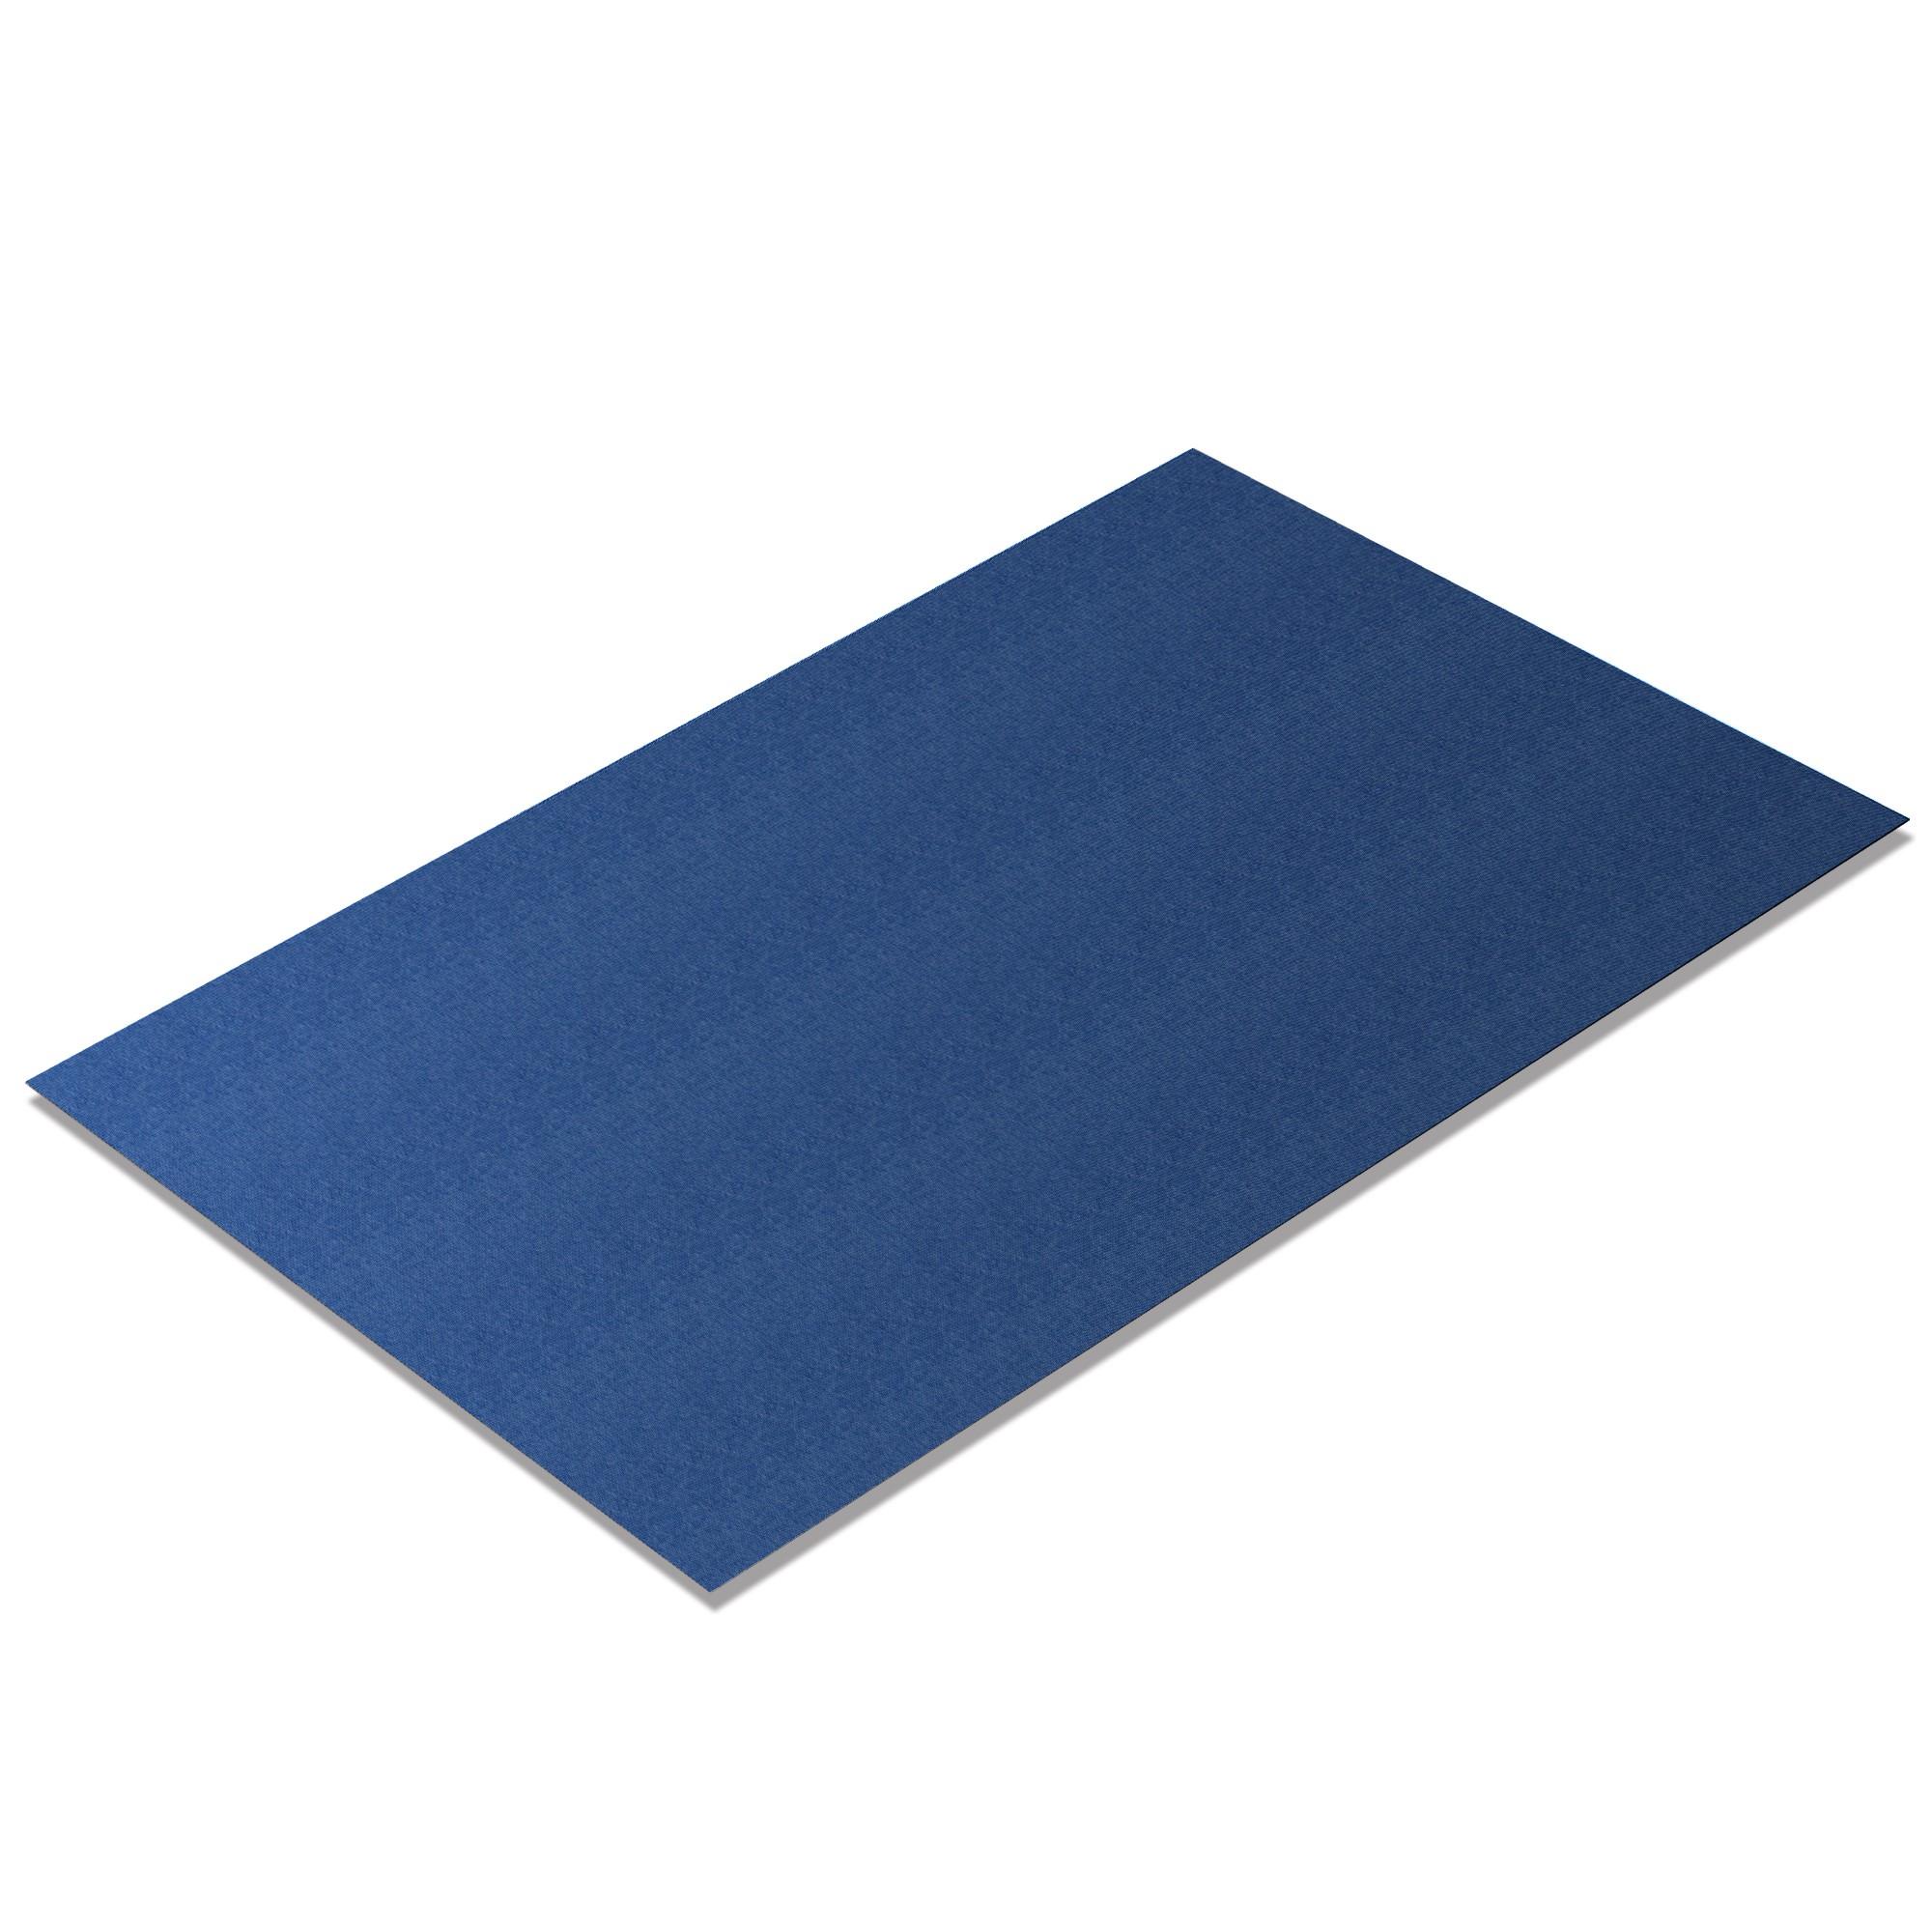 Stoff Meterware Indiana Jeansblau [IND27]